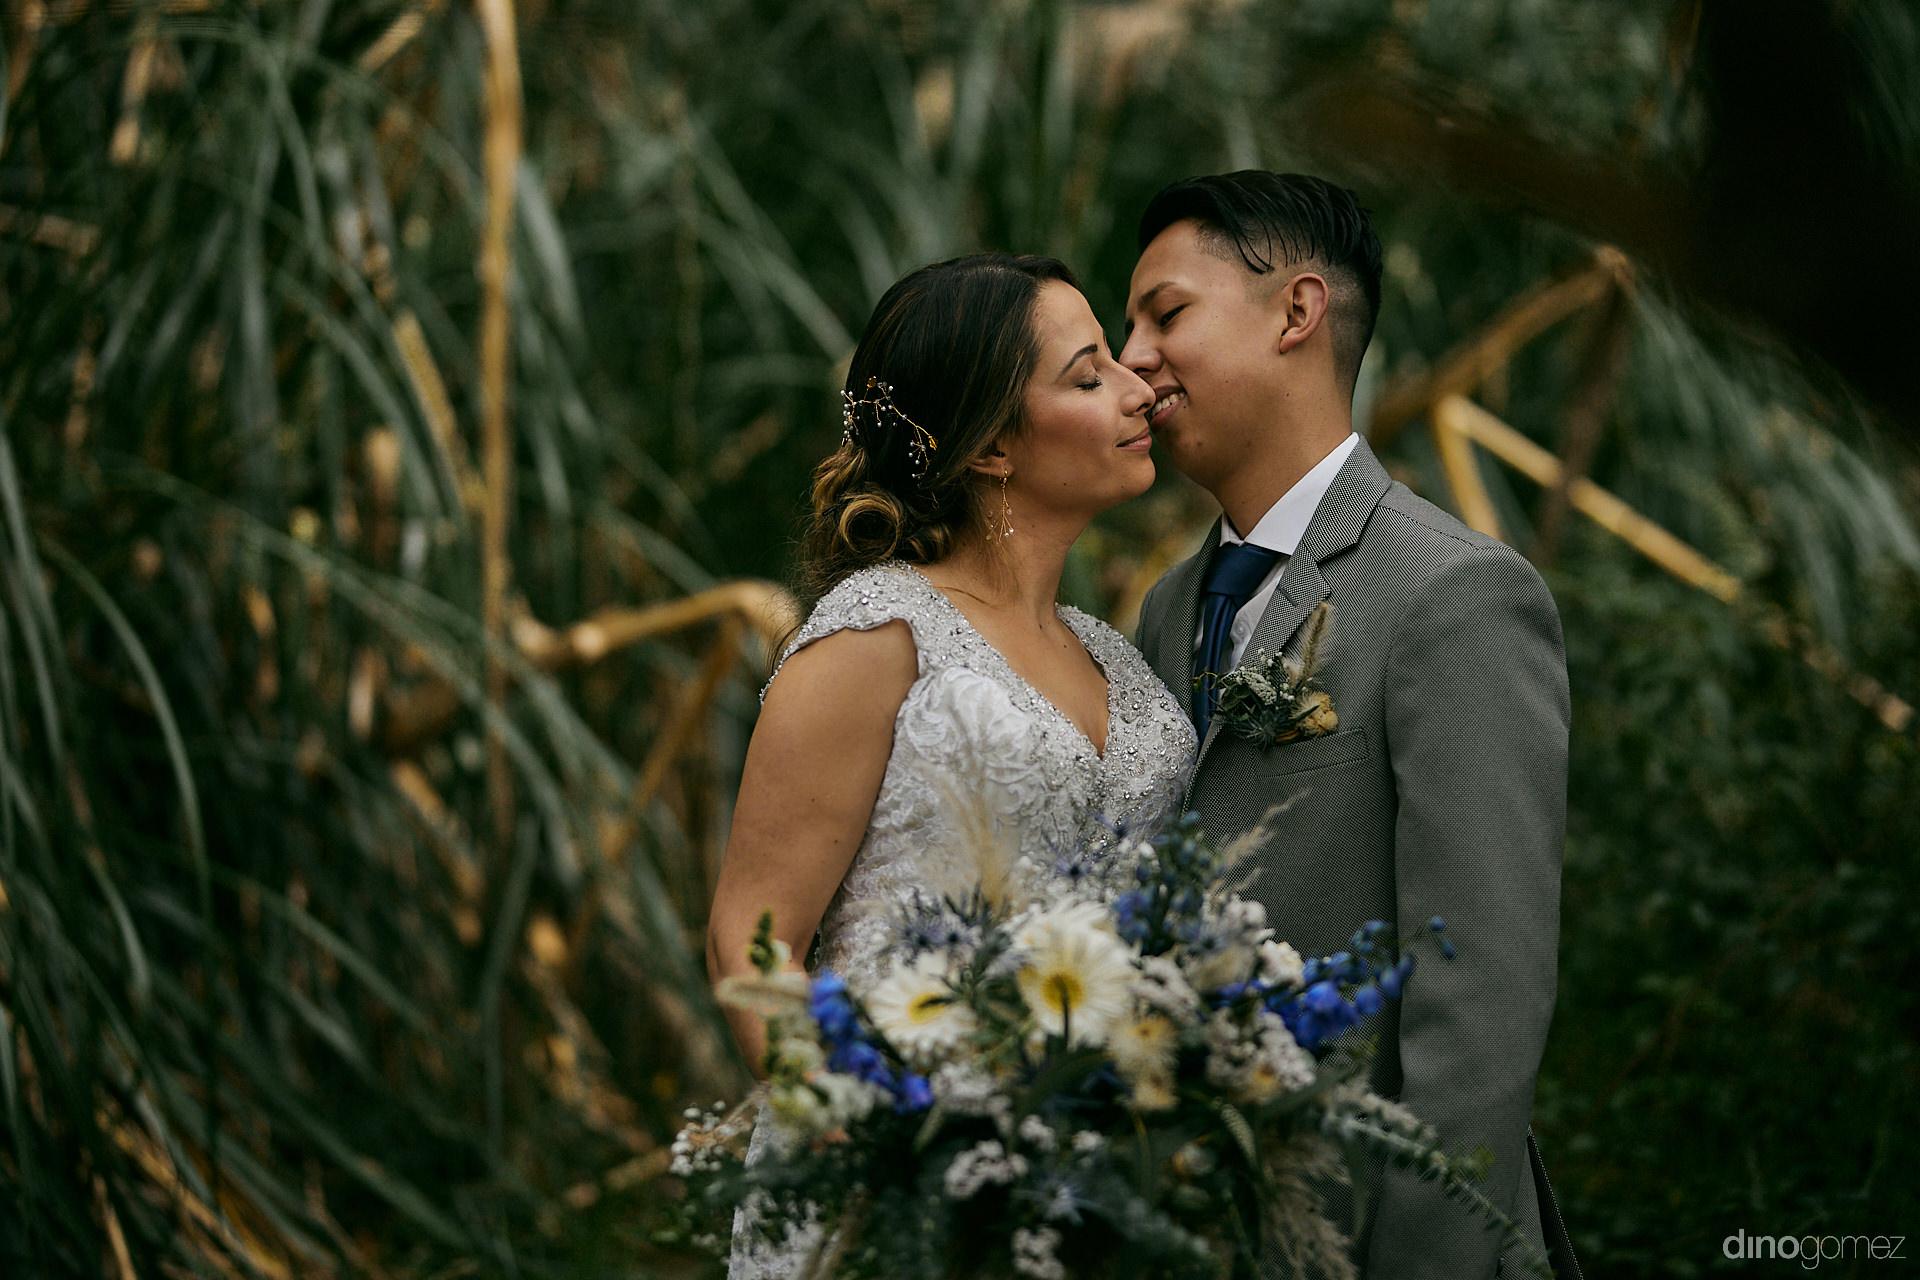 019 - Diy Budget Destination Weddings Can Be Prety Too!